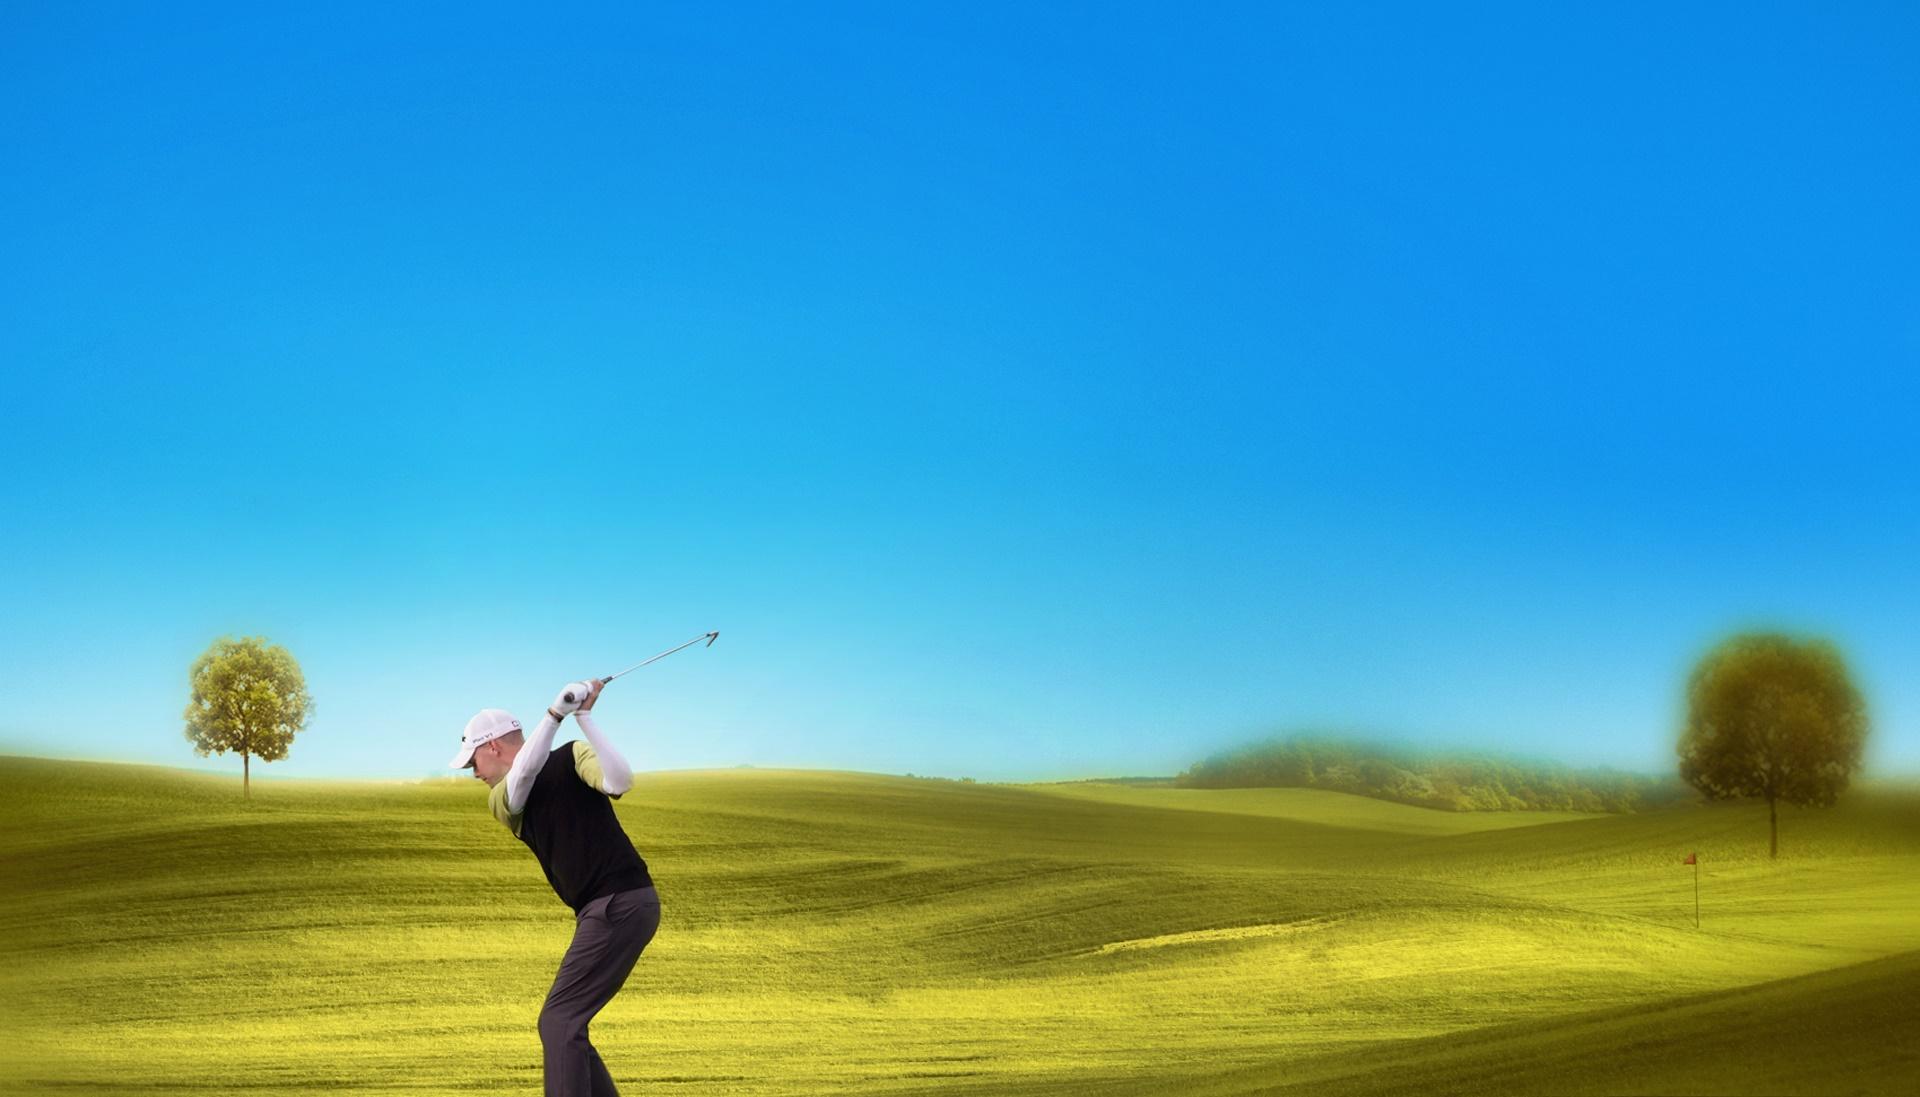 Playing In The Fall Wallpaper Golf Wallpapers Hd Pixelstalk Net